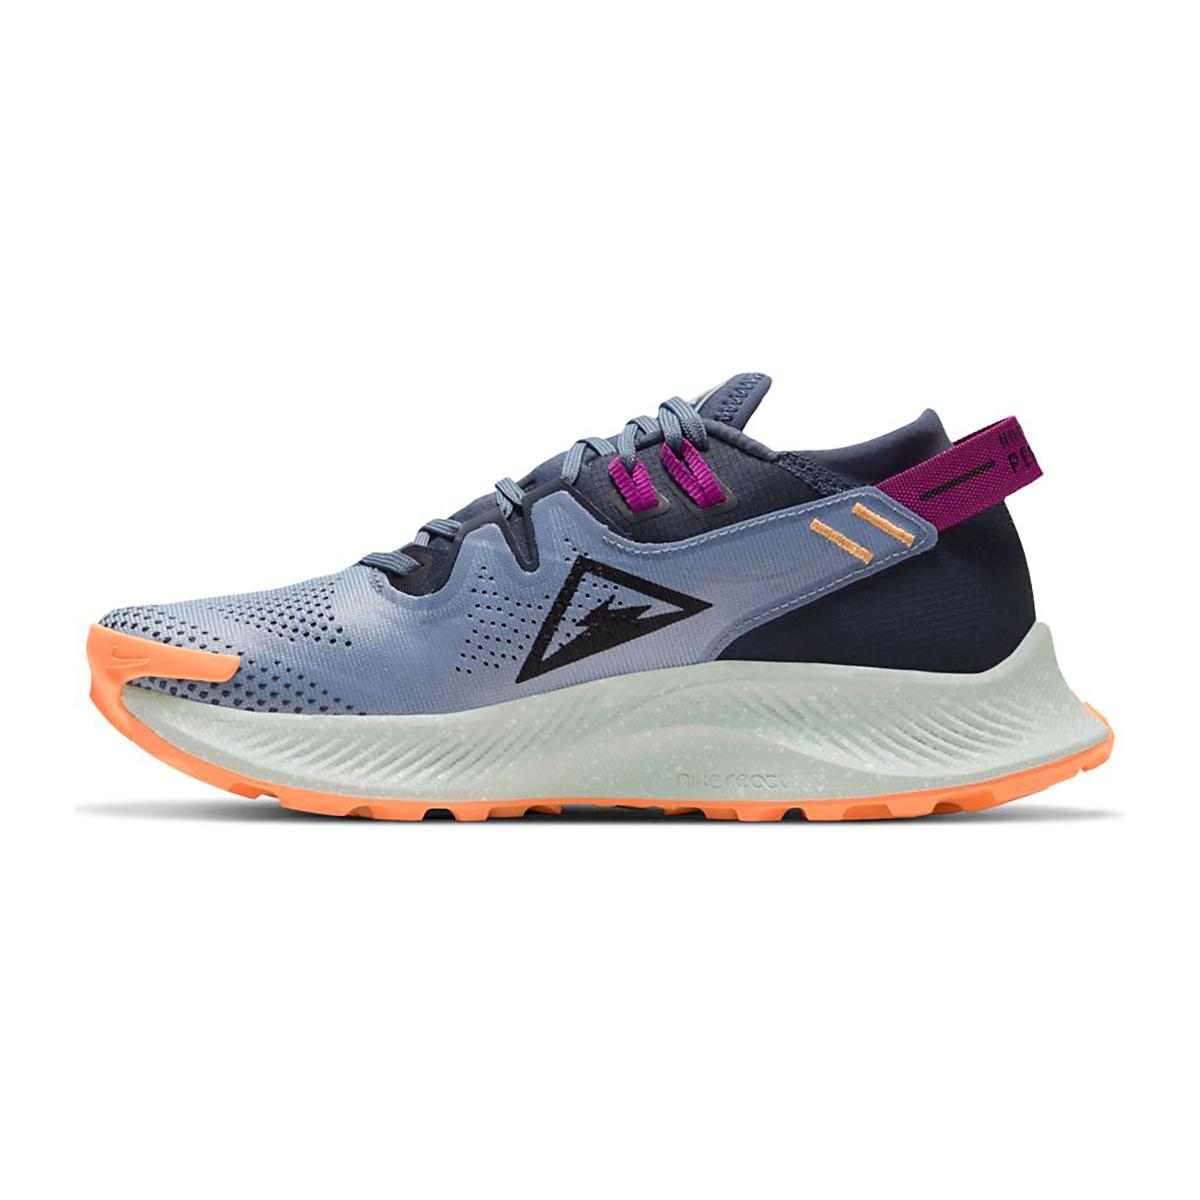 Women's Nike Pegasus Trail 2 Trail Running Shoe - Color: Thunder Blue/Photon Dust/Ashen Slate - Size: 5 - Width: Regular, Thunder Blue/Photon Dust/Ashen Slate, large, image 2